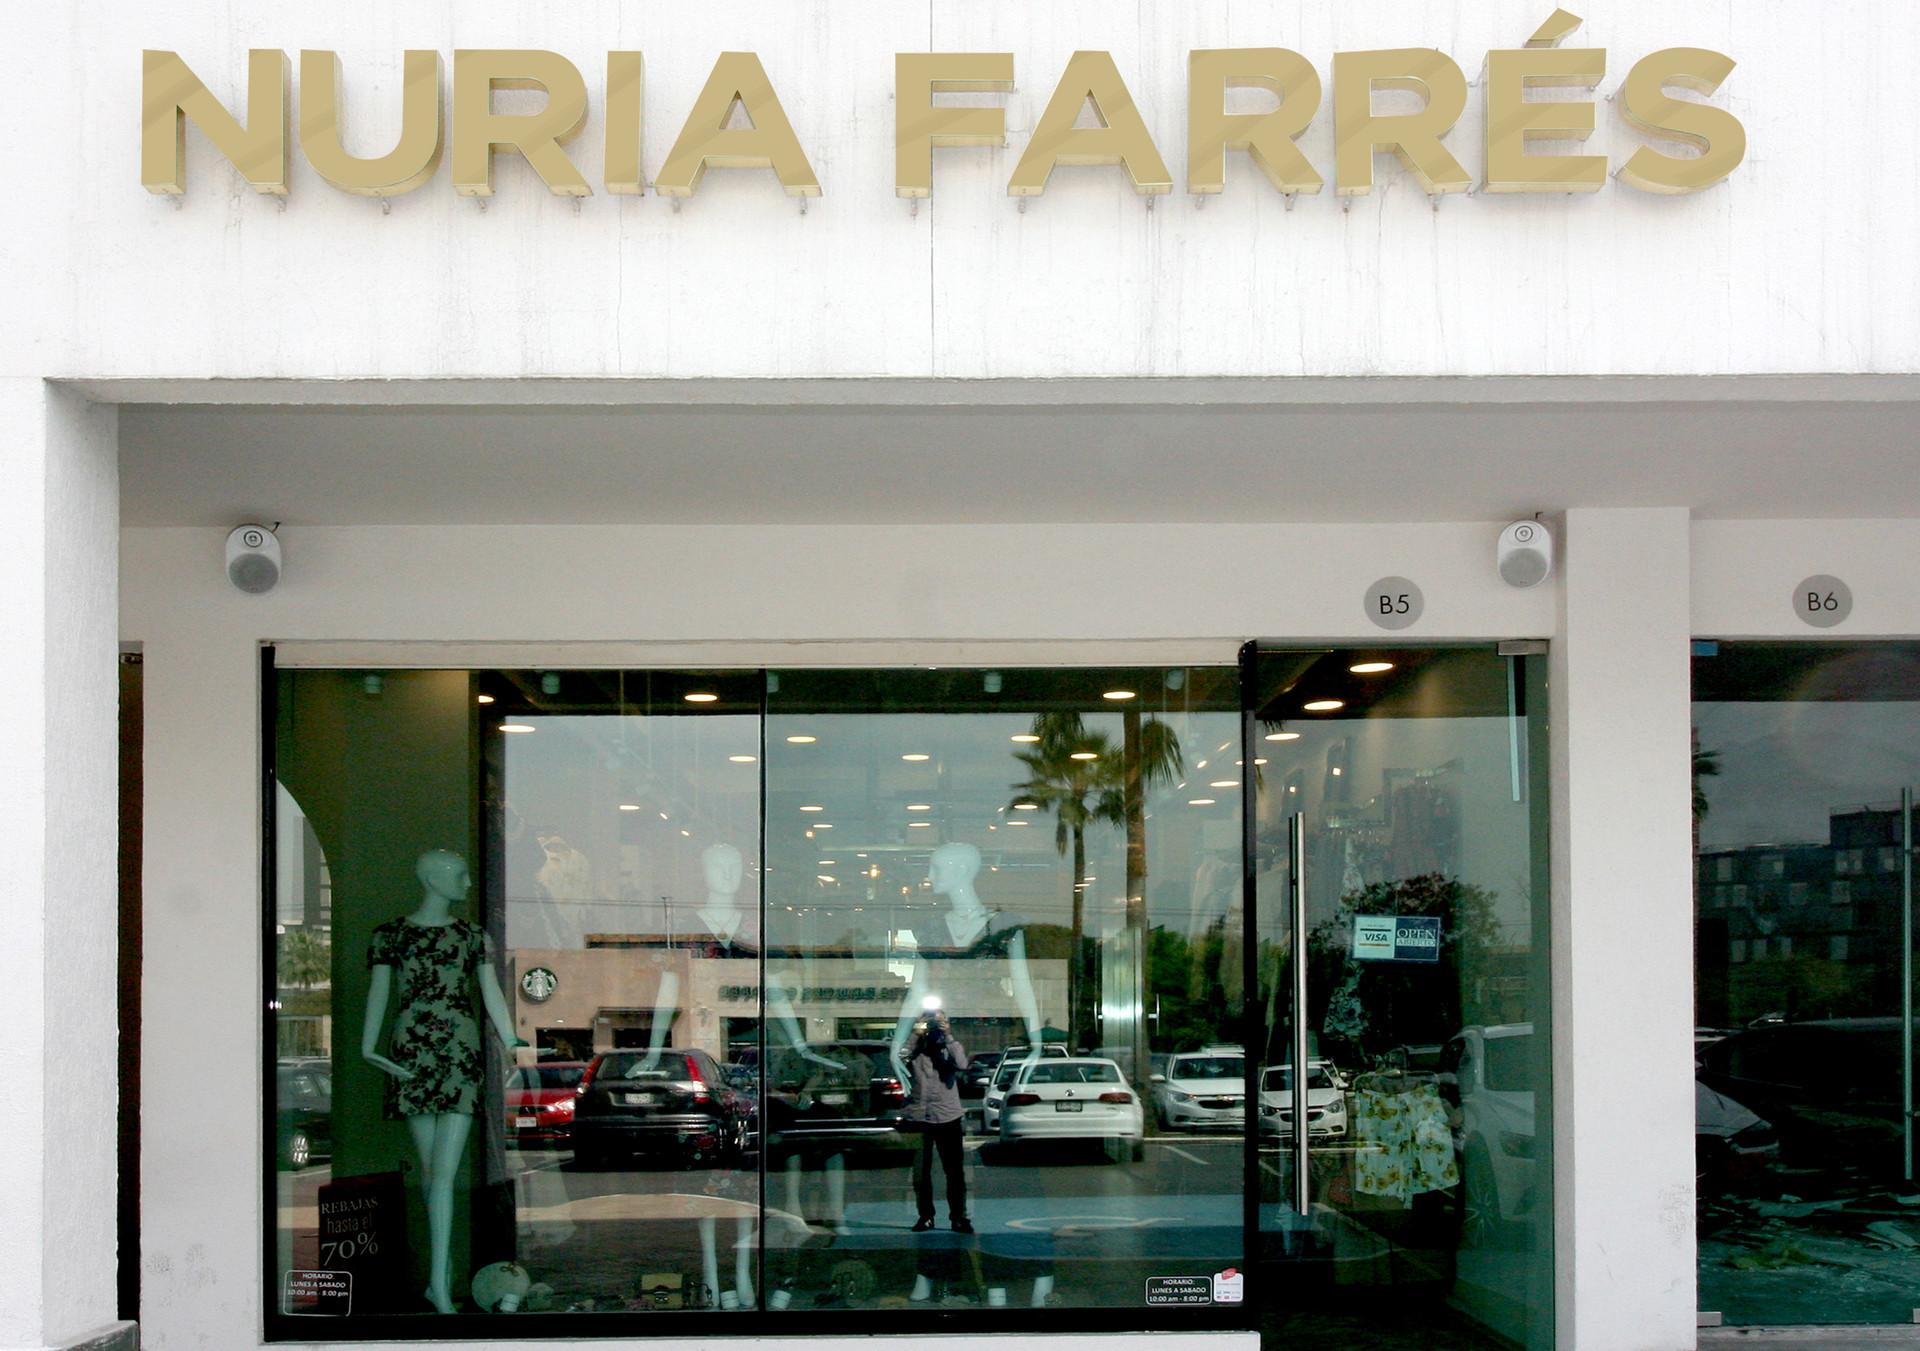 Nuria Farres 02.jpg